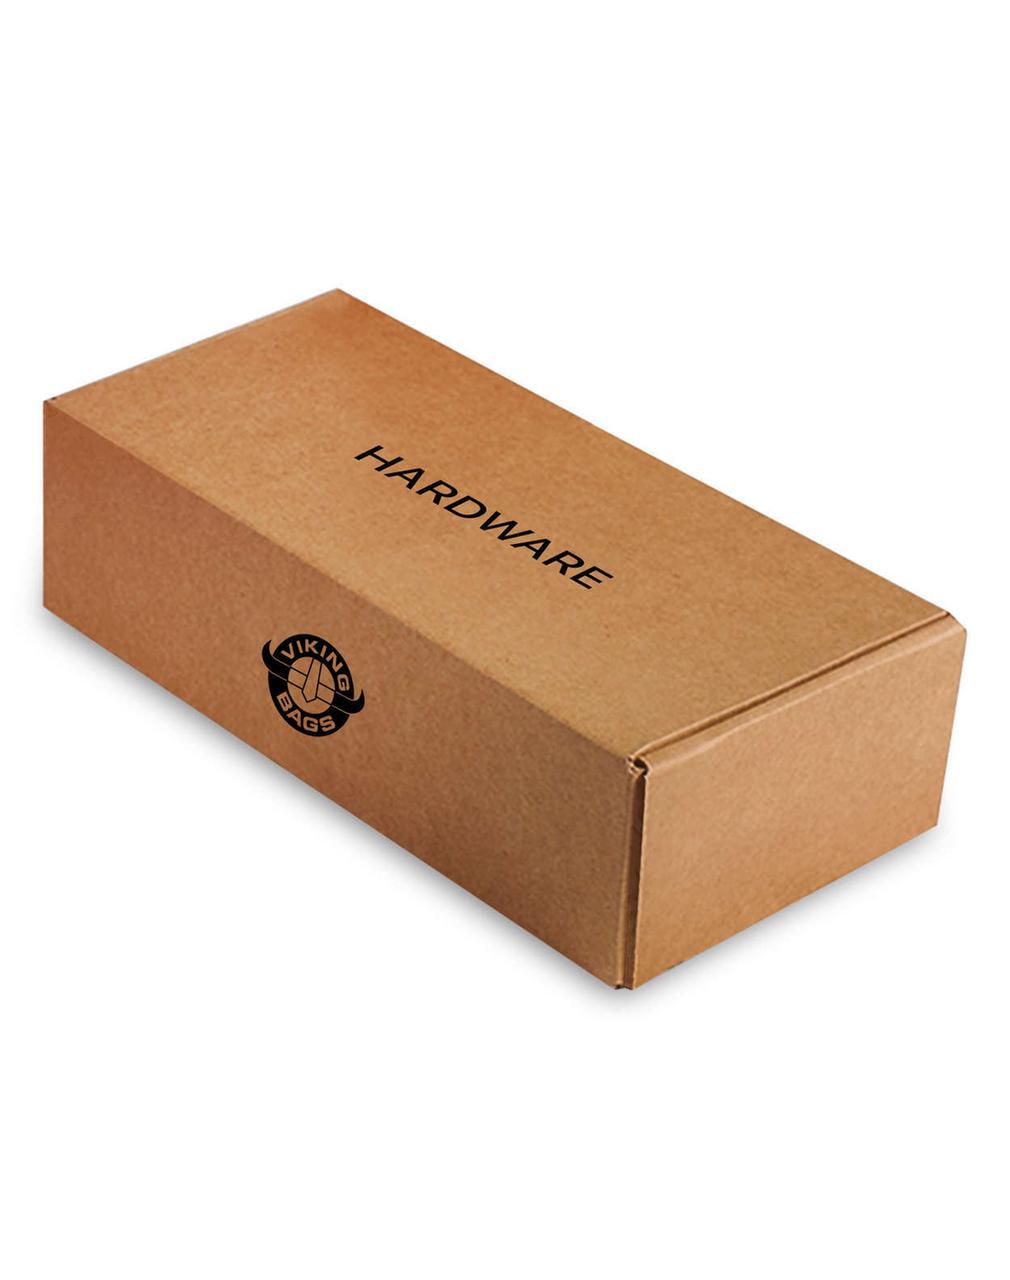 Honda 750 Shadow Aero Slant Medium Motorcycle Saddlebags Box